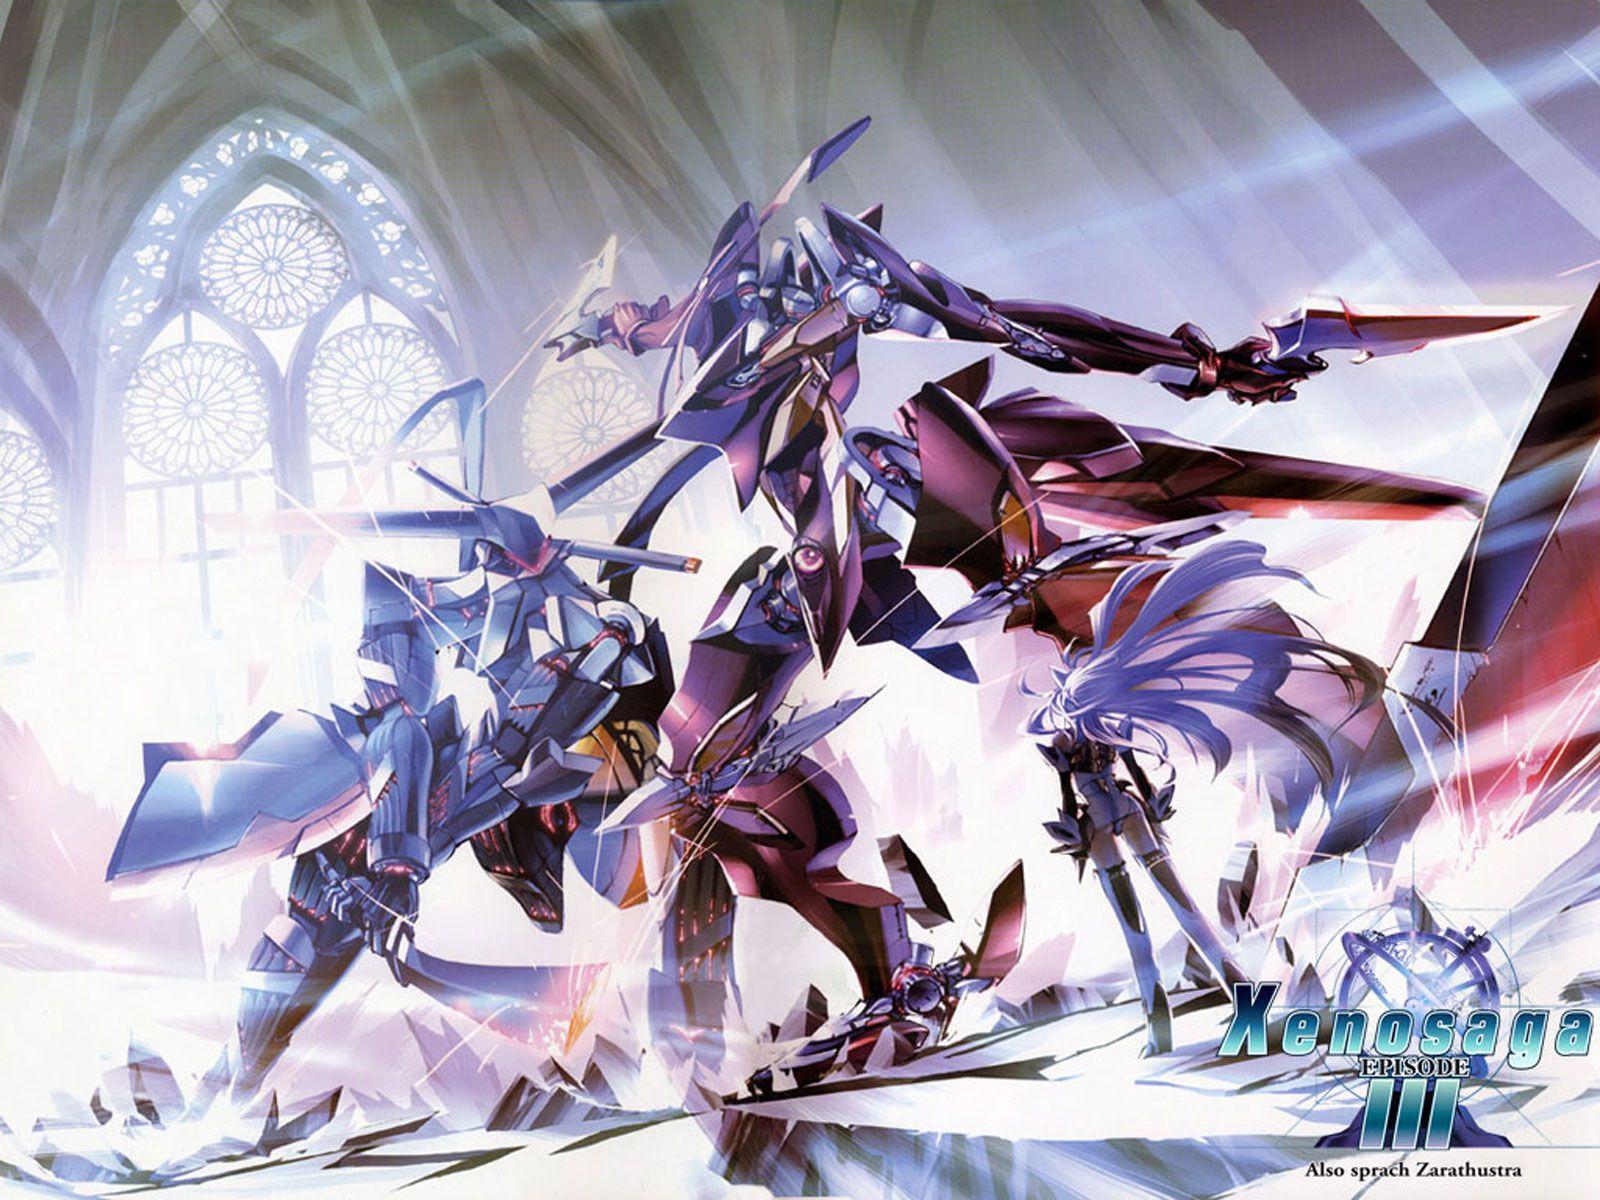 [Top 10] Os 10 Melhores Jogos de RPG A7dd833c67f75370be50bcd3e91e808e